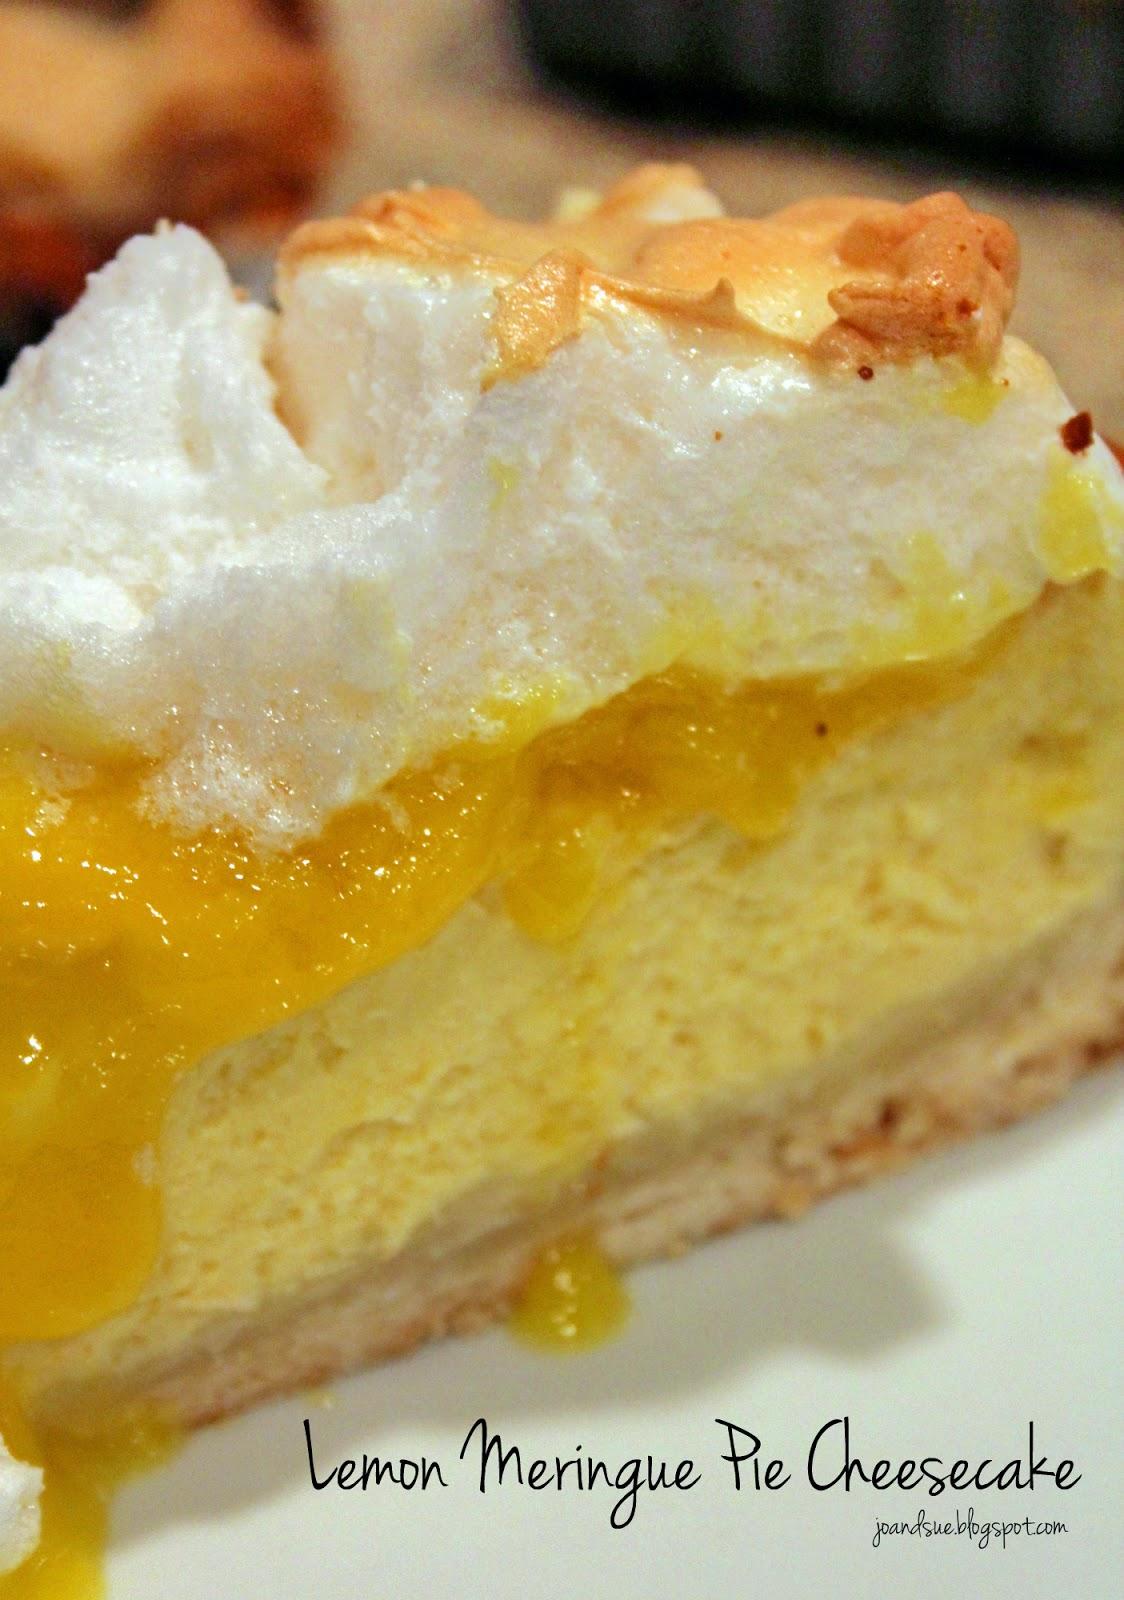 Jo and Sue: Lemon Meringue Pie Cheesecake